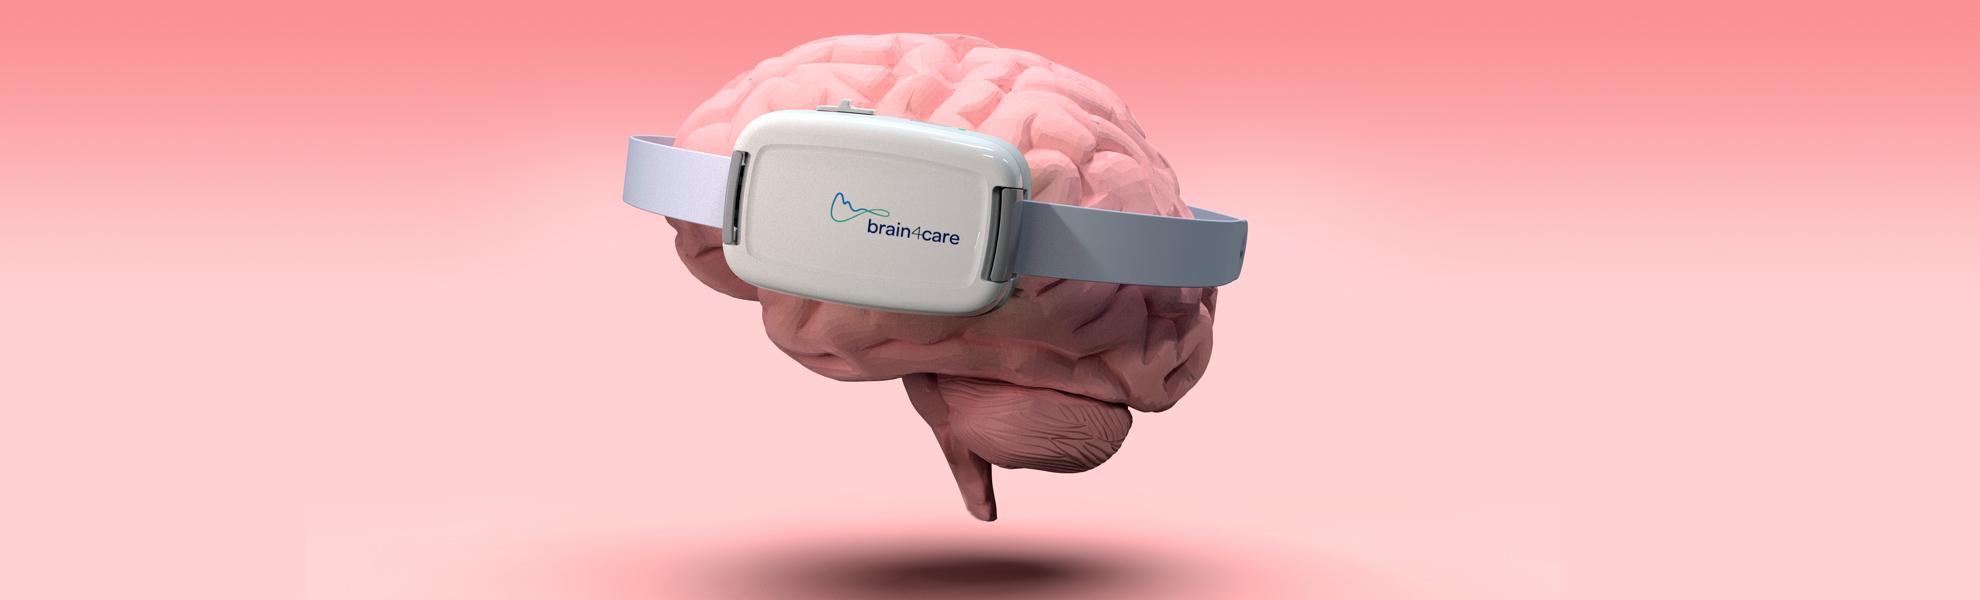 chelles-e-hayashi-design-portfolio-braincare-pic-nao-invasiva-produto-experiencia-estrutural